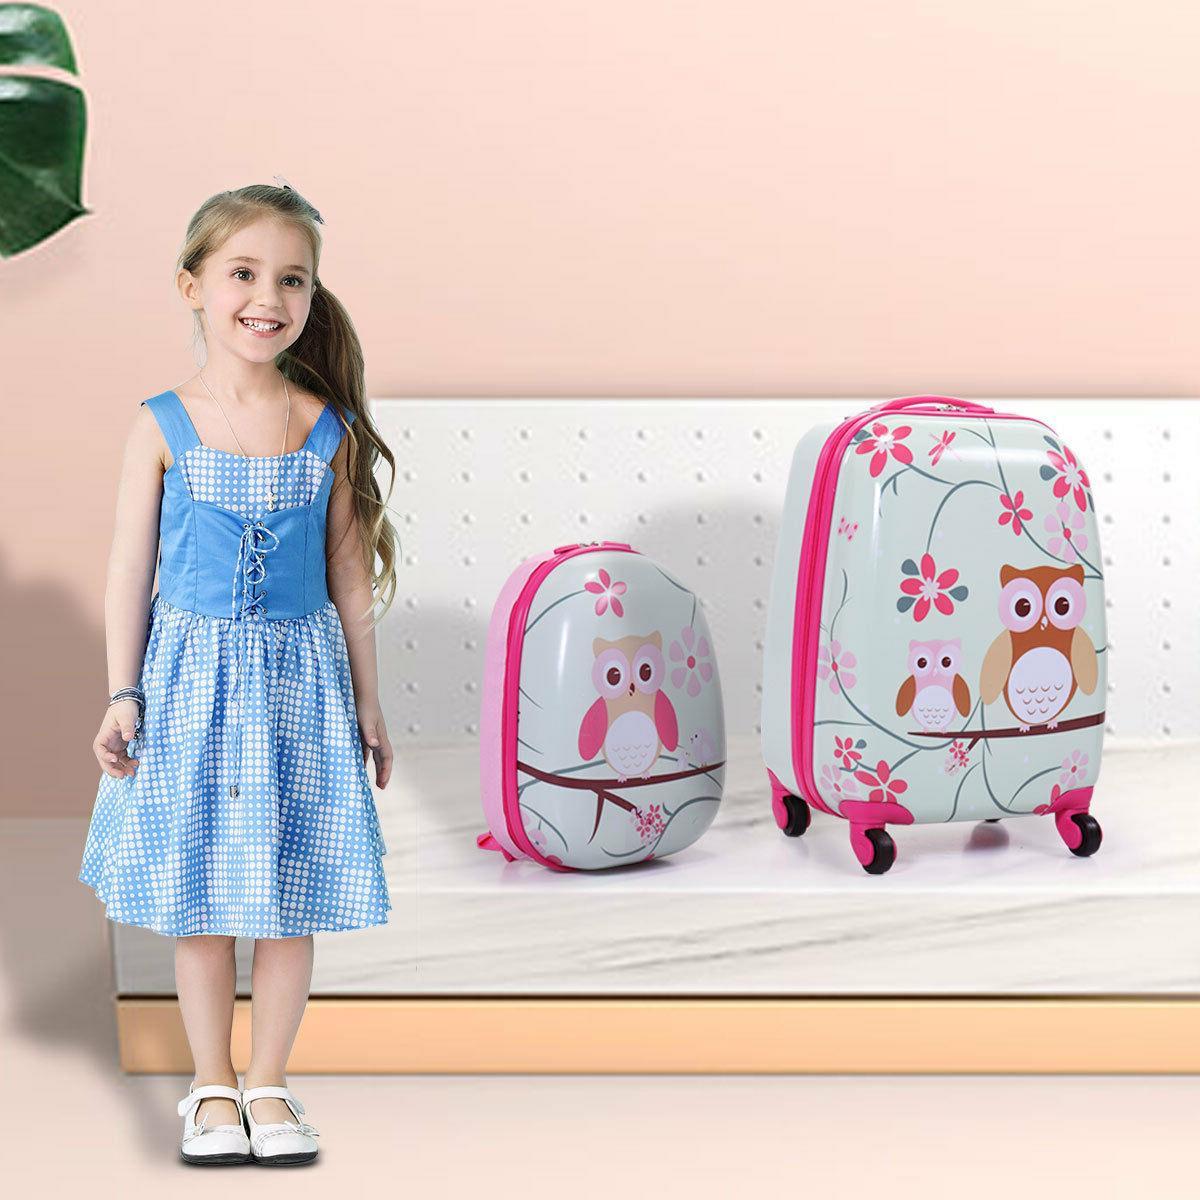 2pc kids carry on luggage set upright